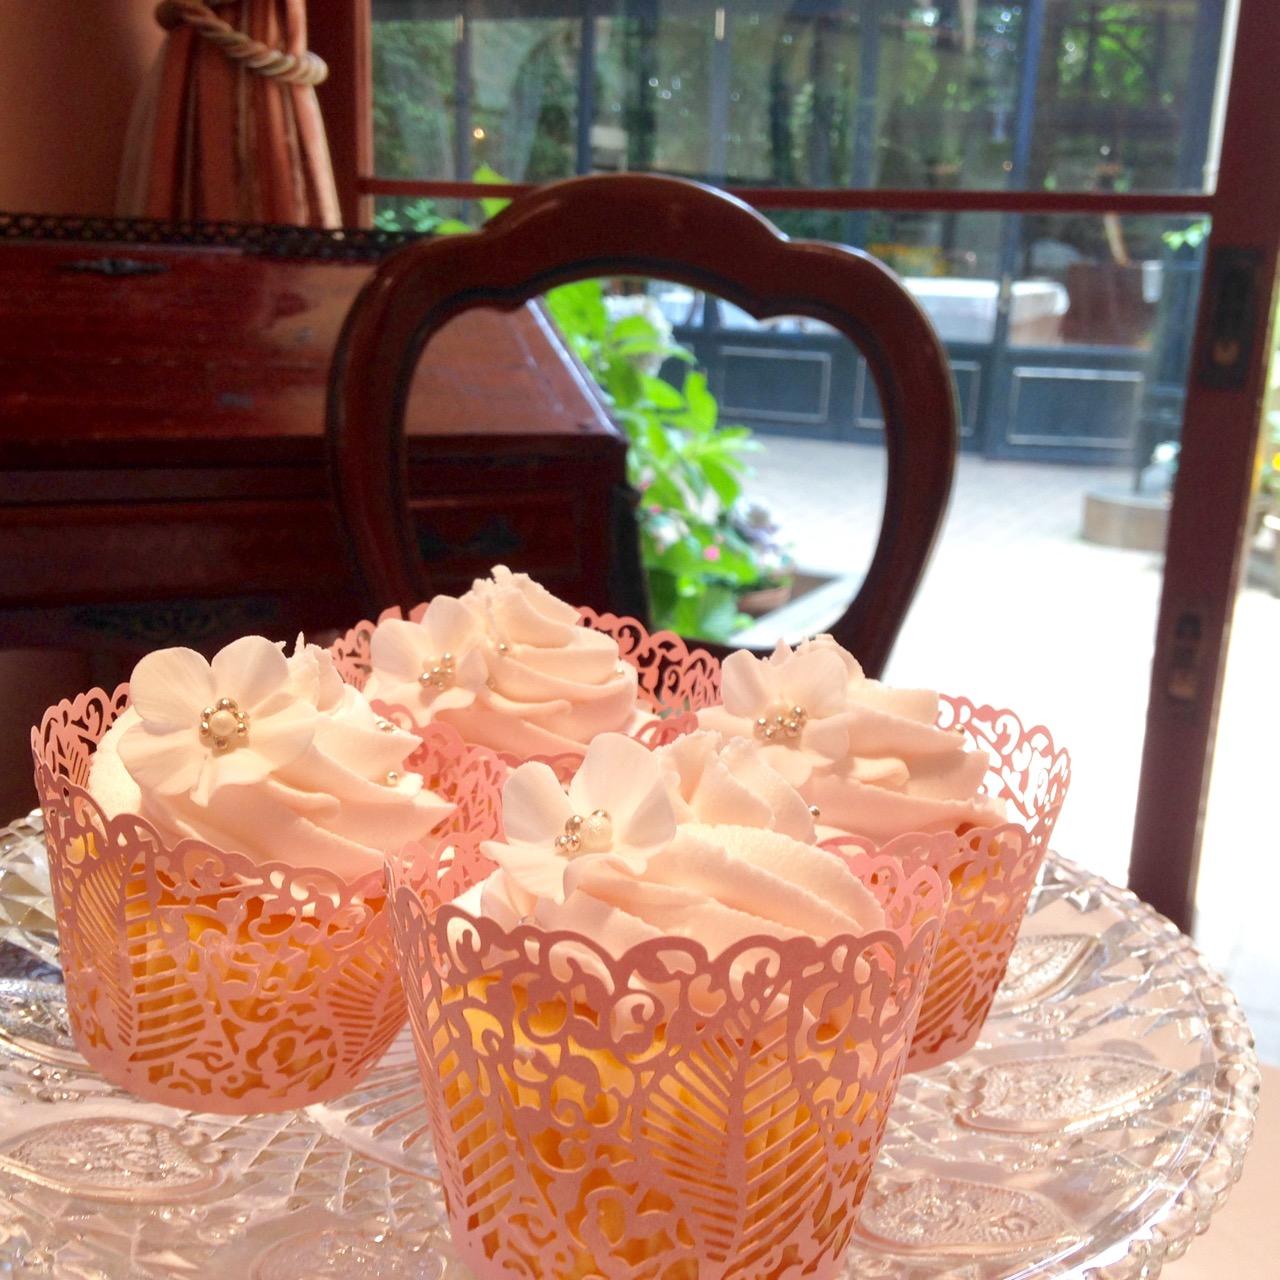 20150813-cupcake-aso5